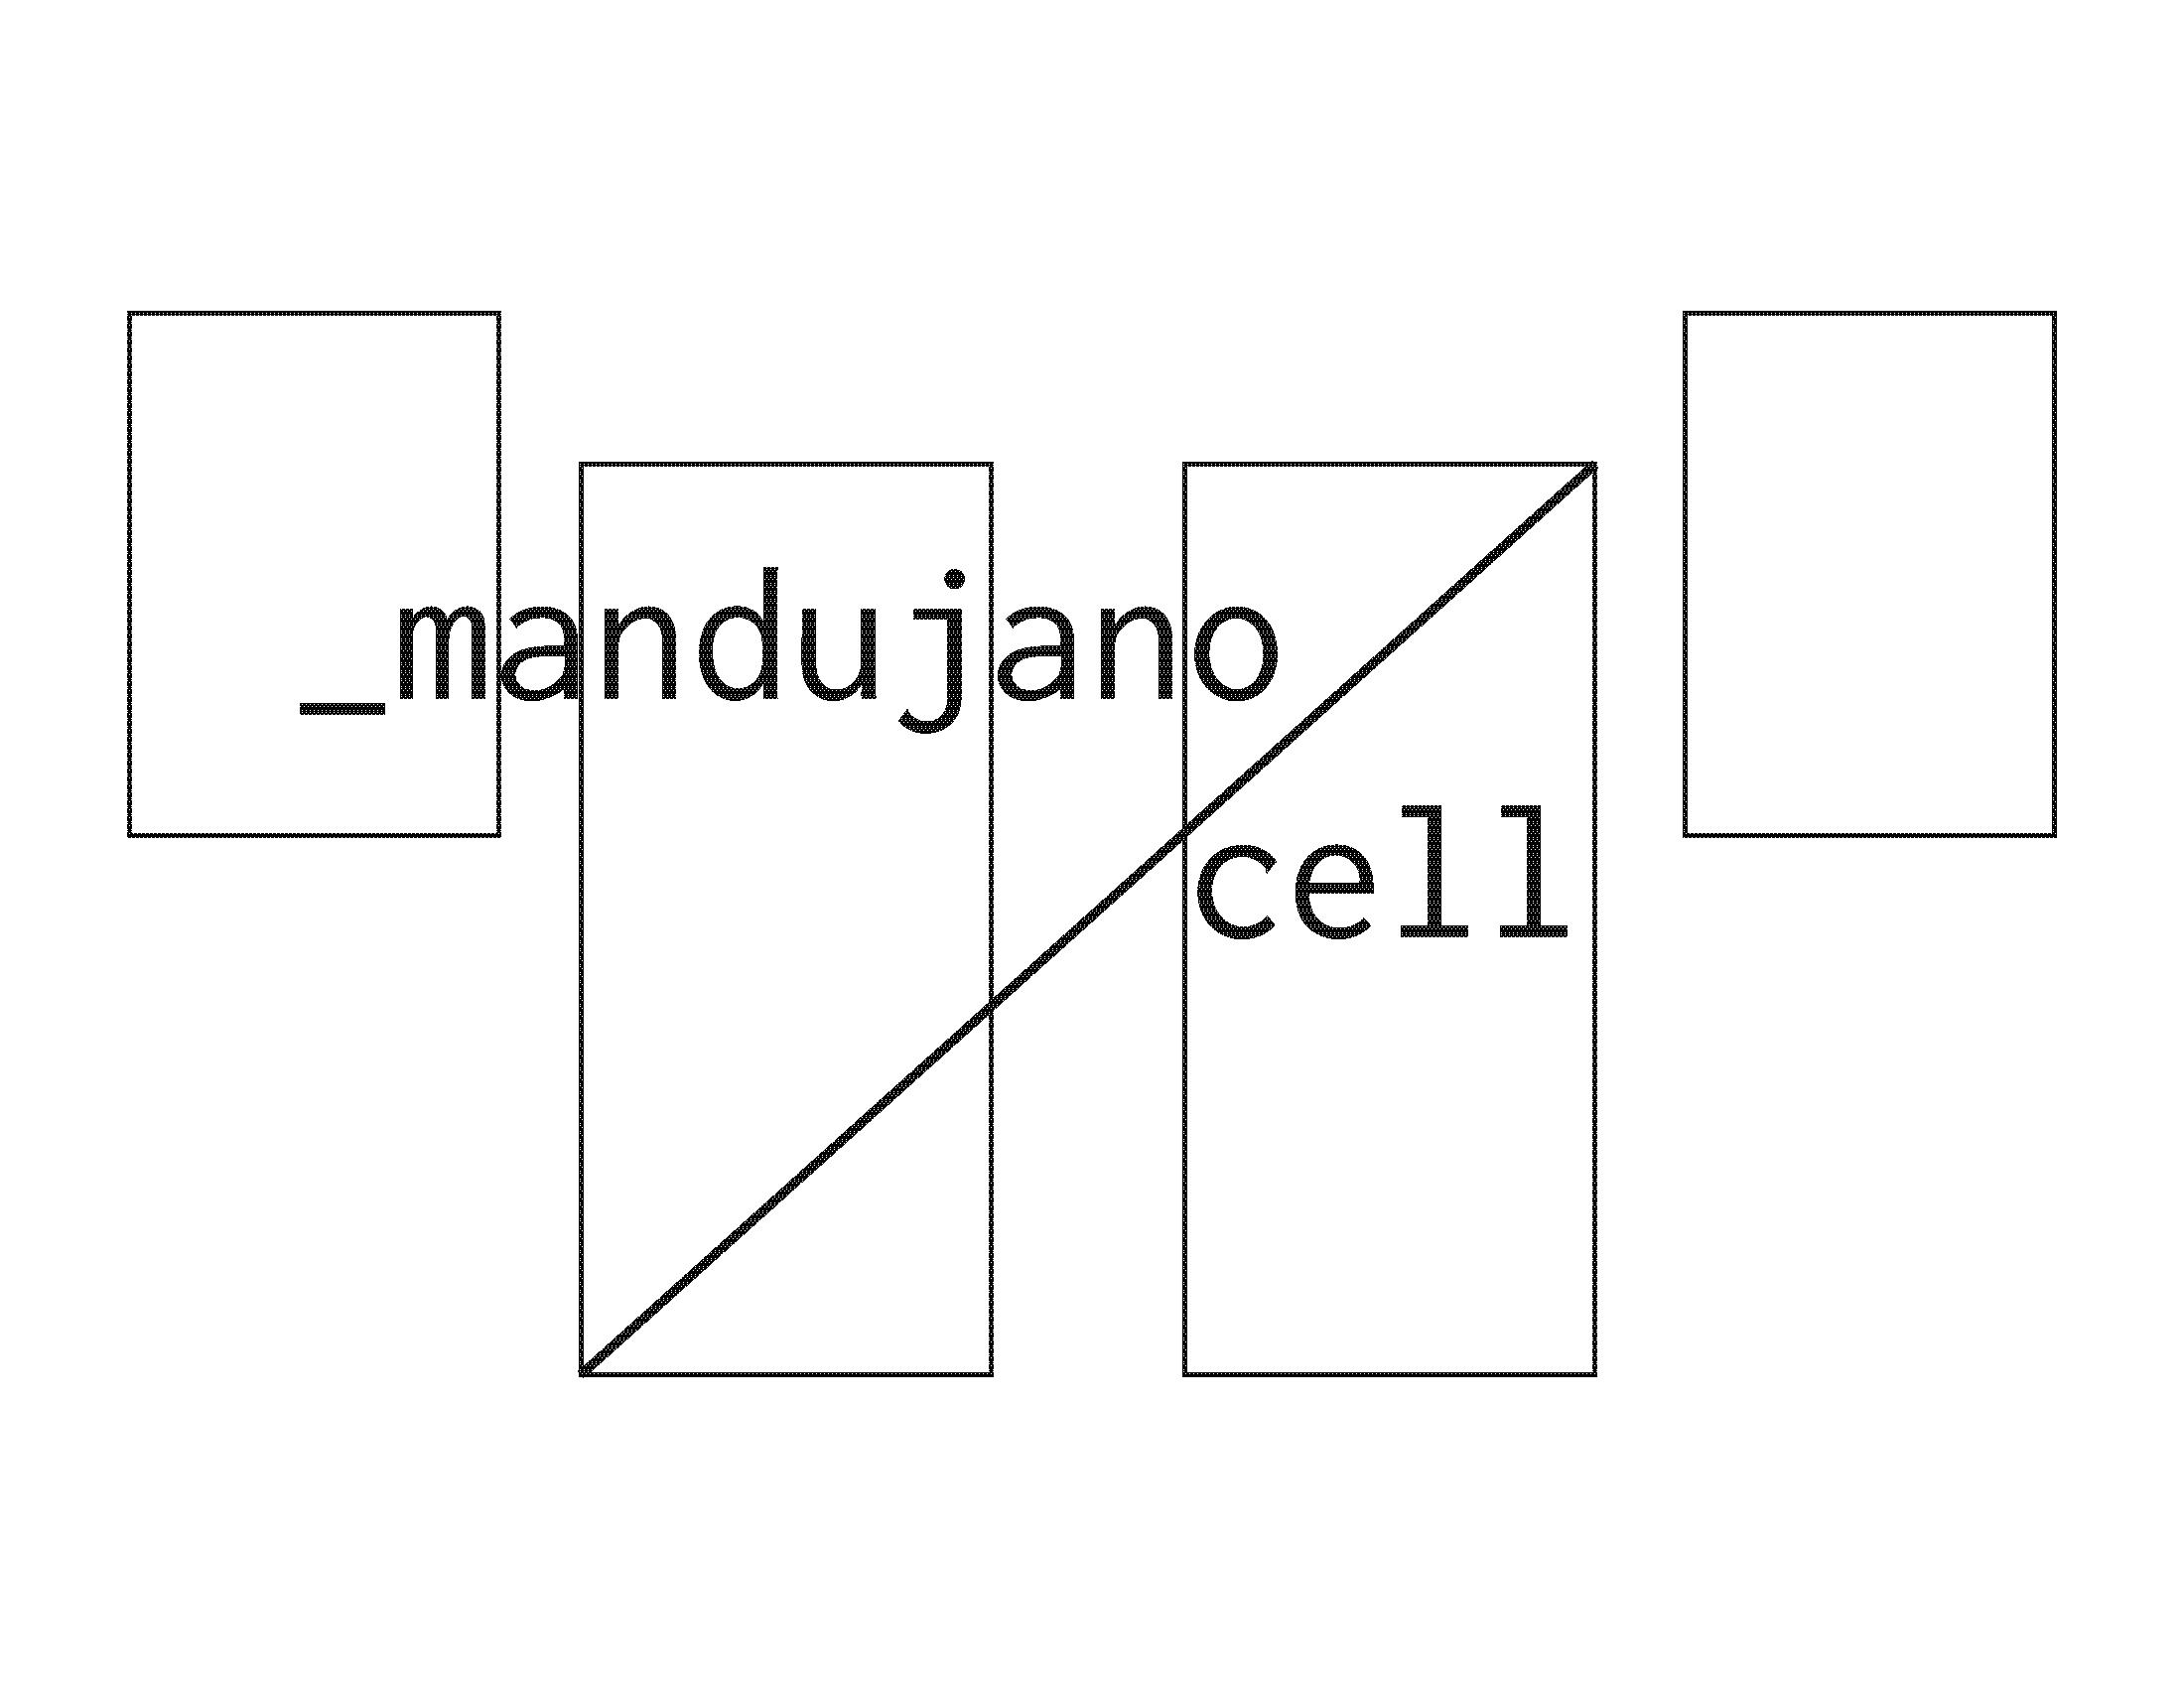 mandujano_cell_logo_final copy.png